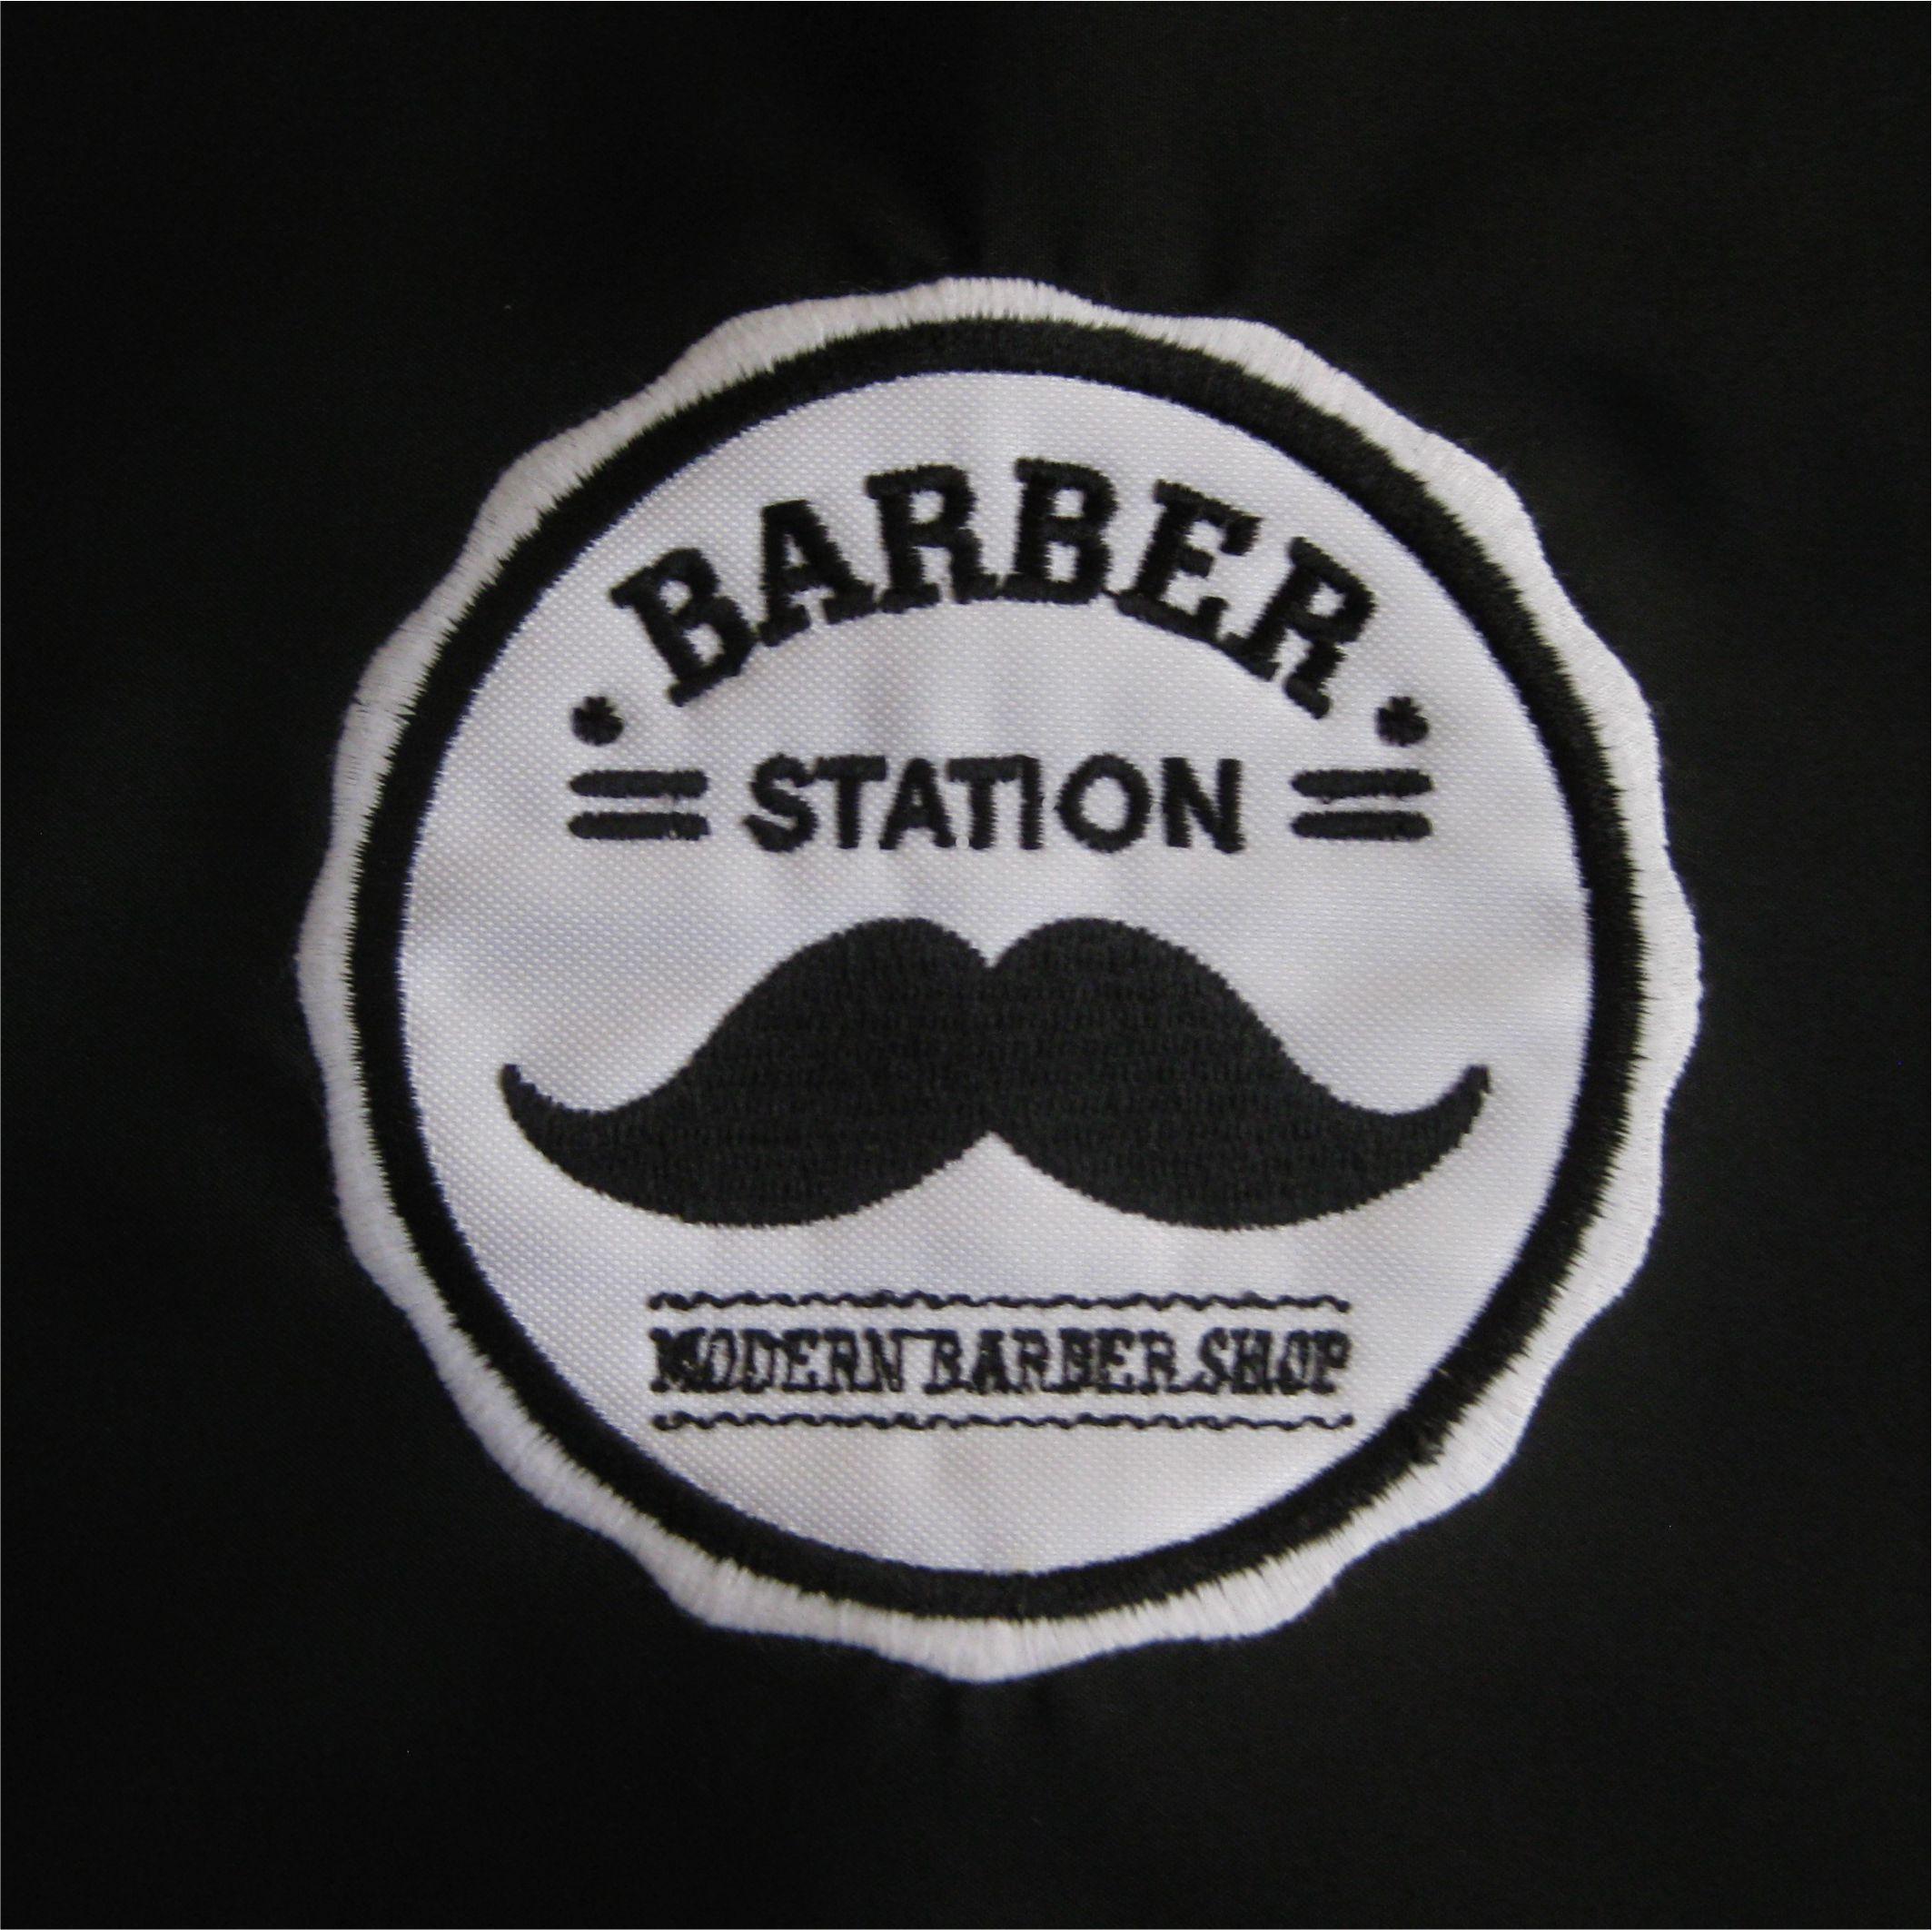 Logo Barber Station Www Botextilprint Es Botextilprint